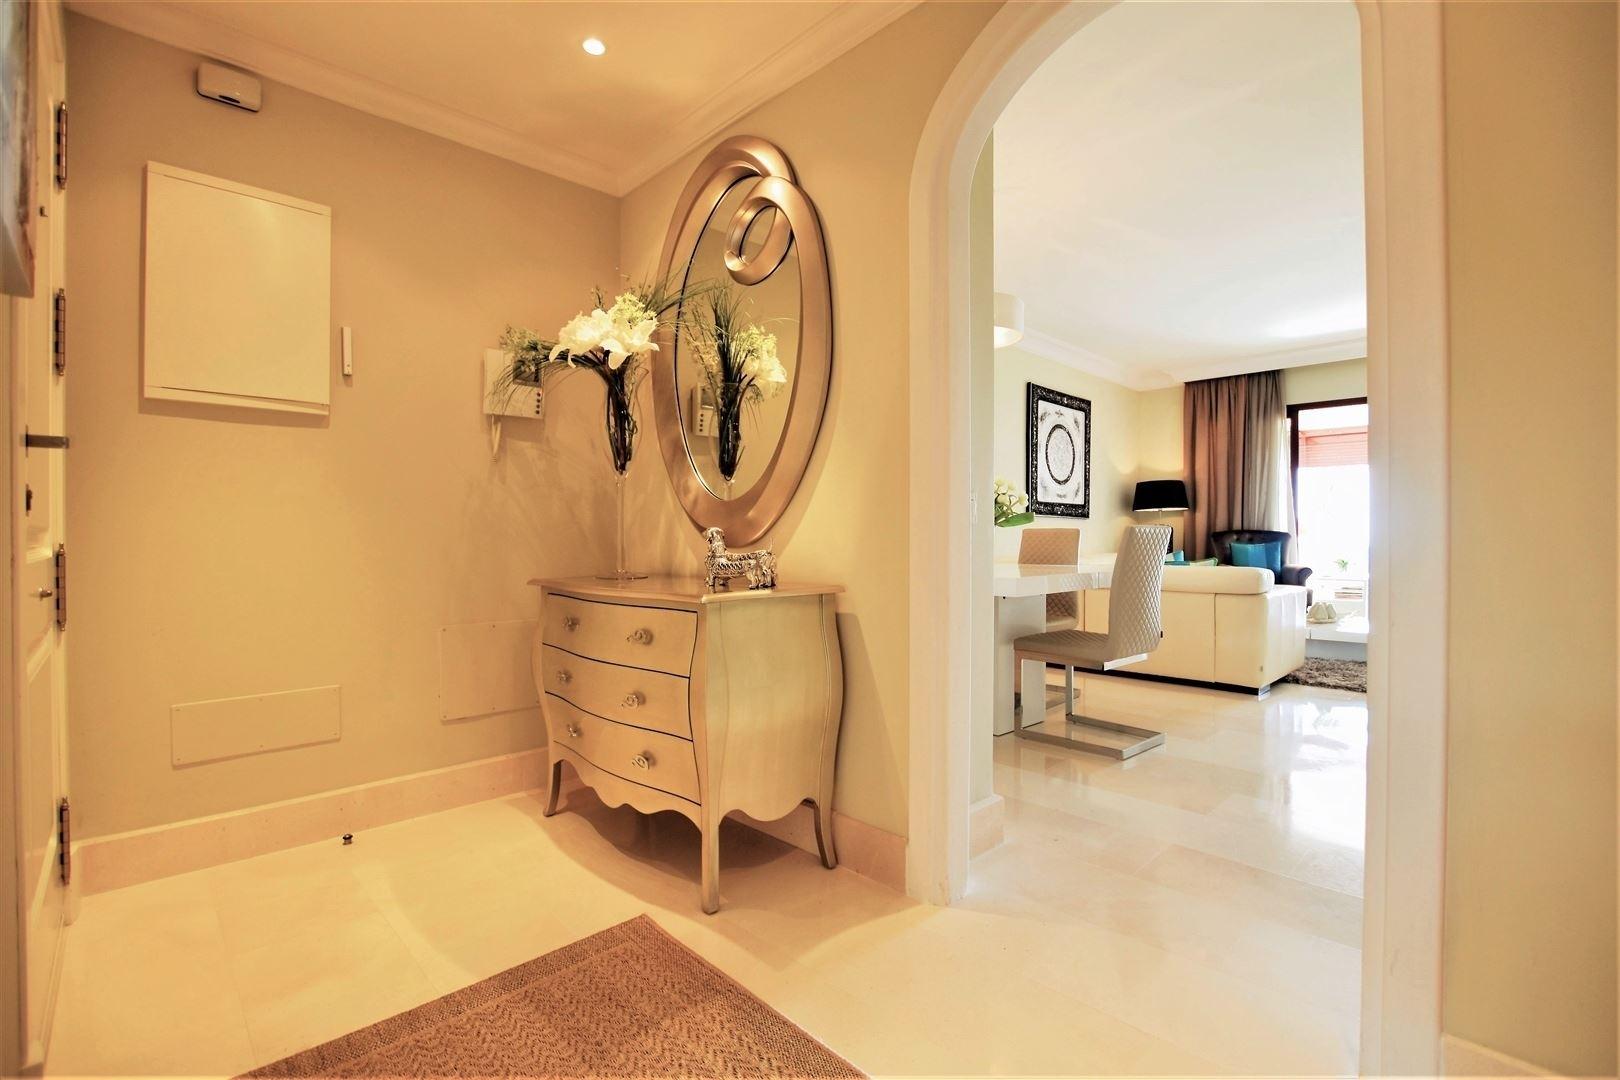 Foto 4 : Appartement te 29679 MARBELLA (Spanje) - Prijs € 1.750